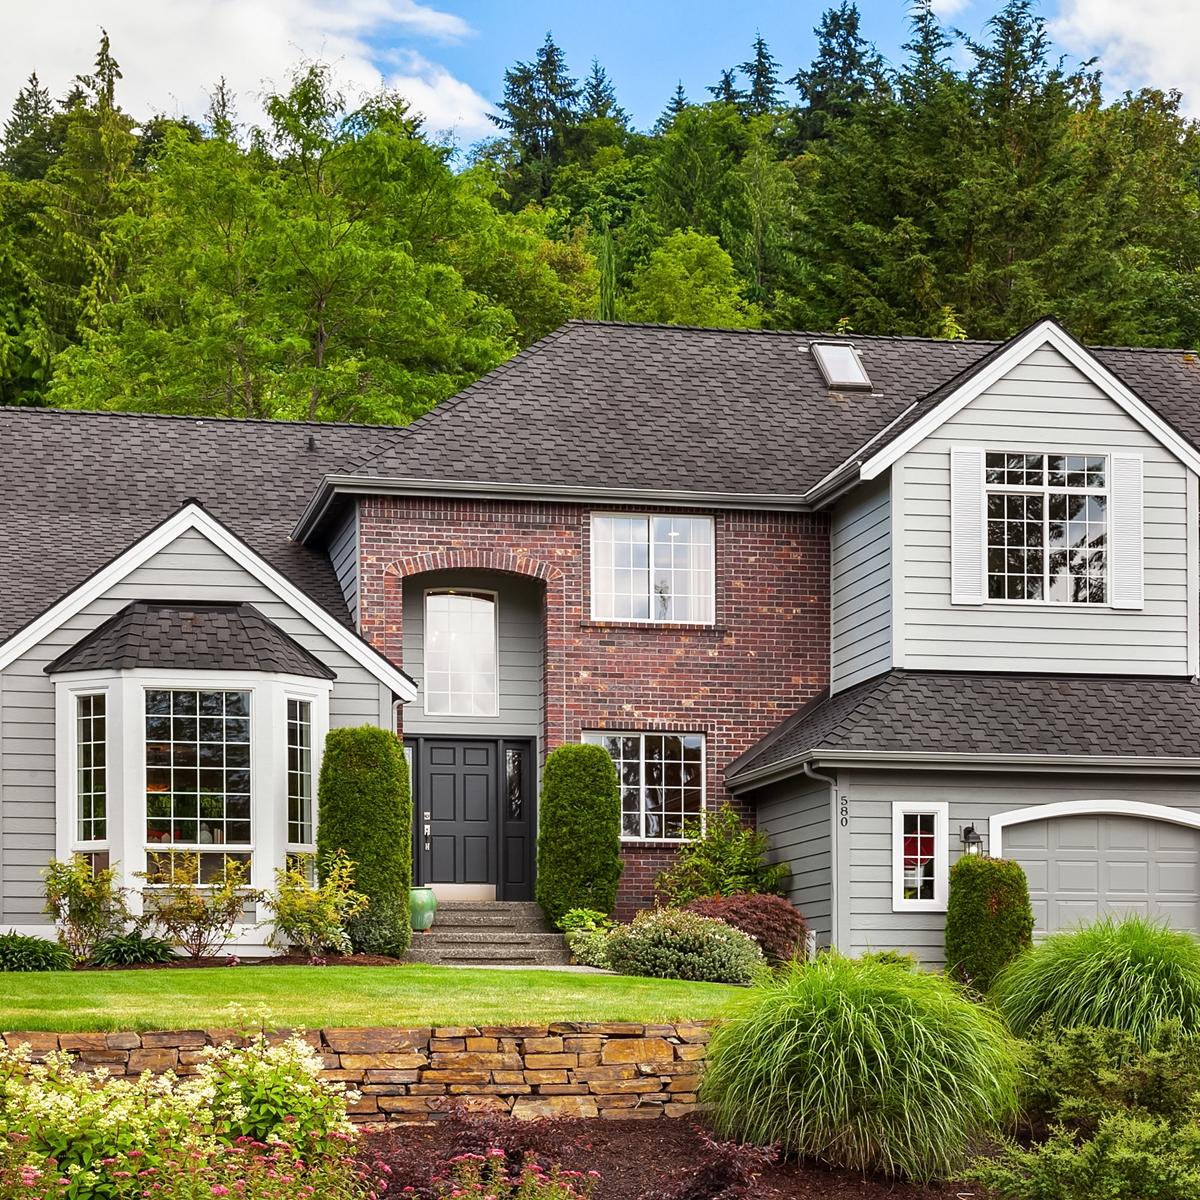 Lancaster Ridge - $1,195,000